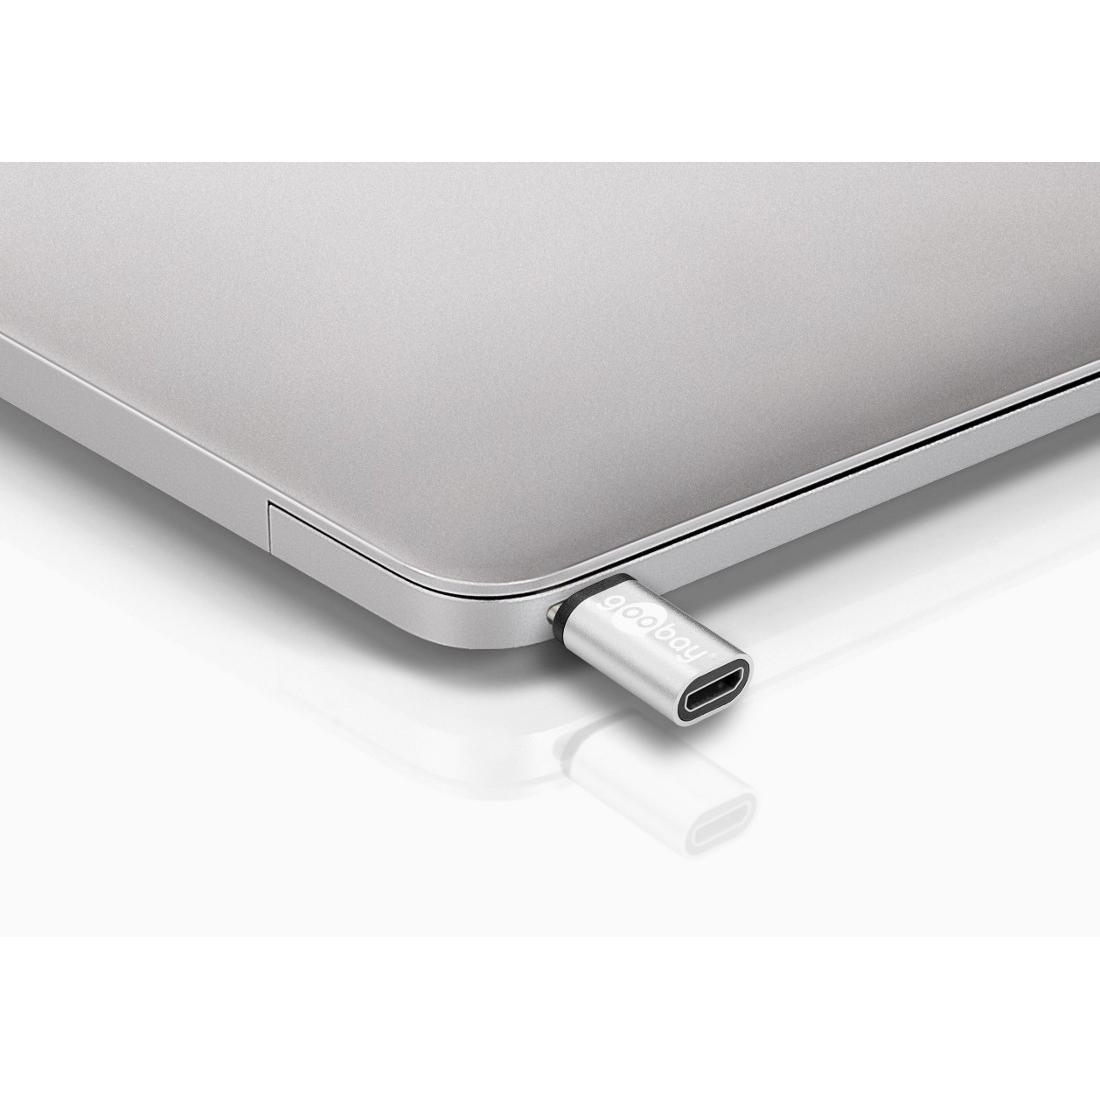 Adattatore USB-C™ Maschio a USB Micro-B Femmina Silver